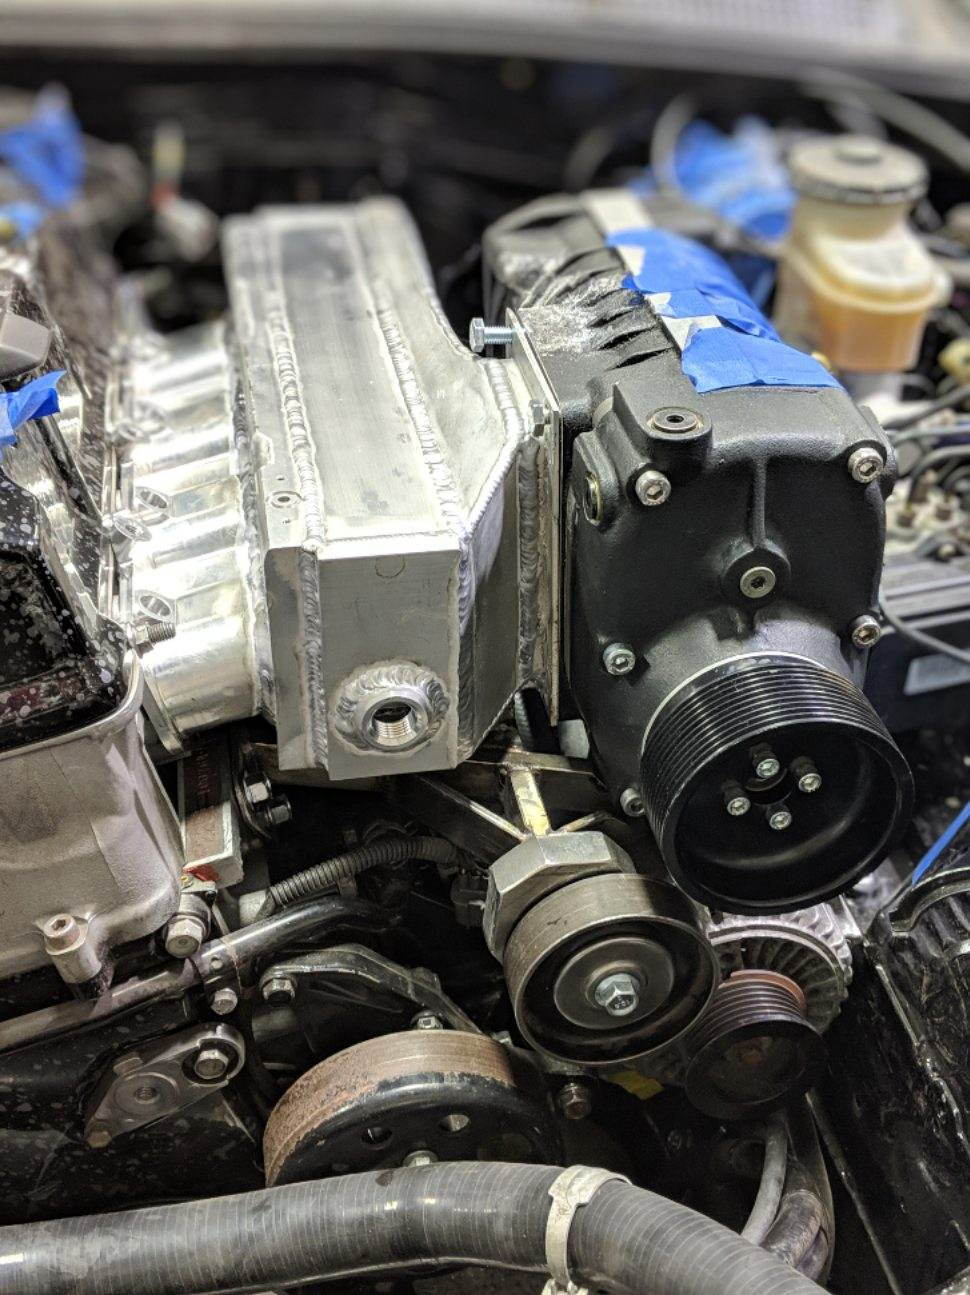 Whipple Supercharger S2000 Kit - S2KI Honda S2000 Forums